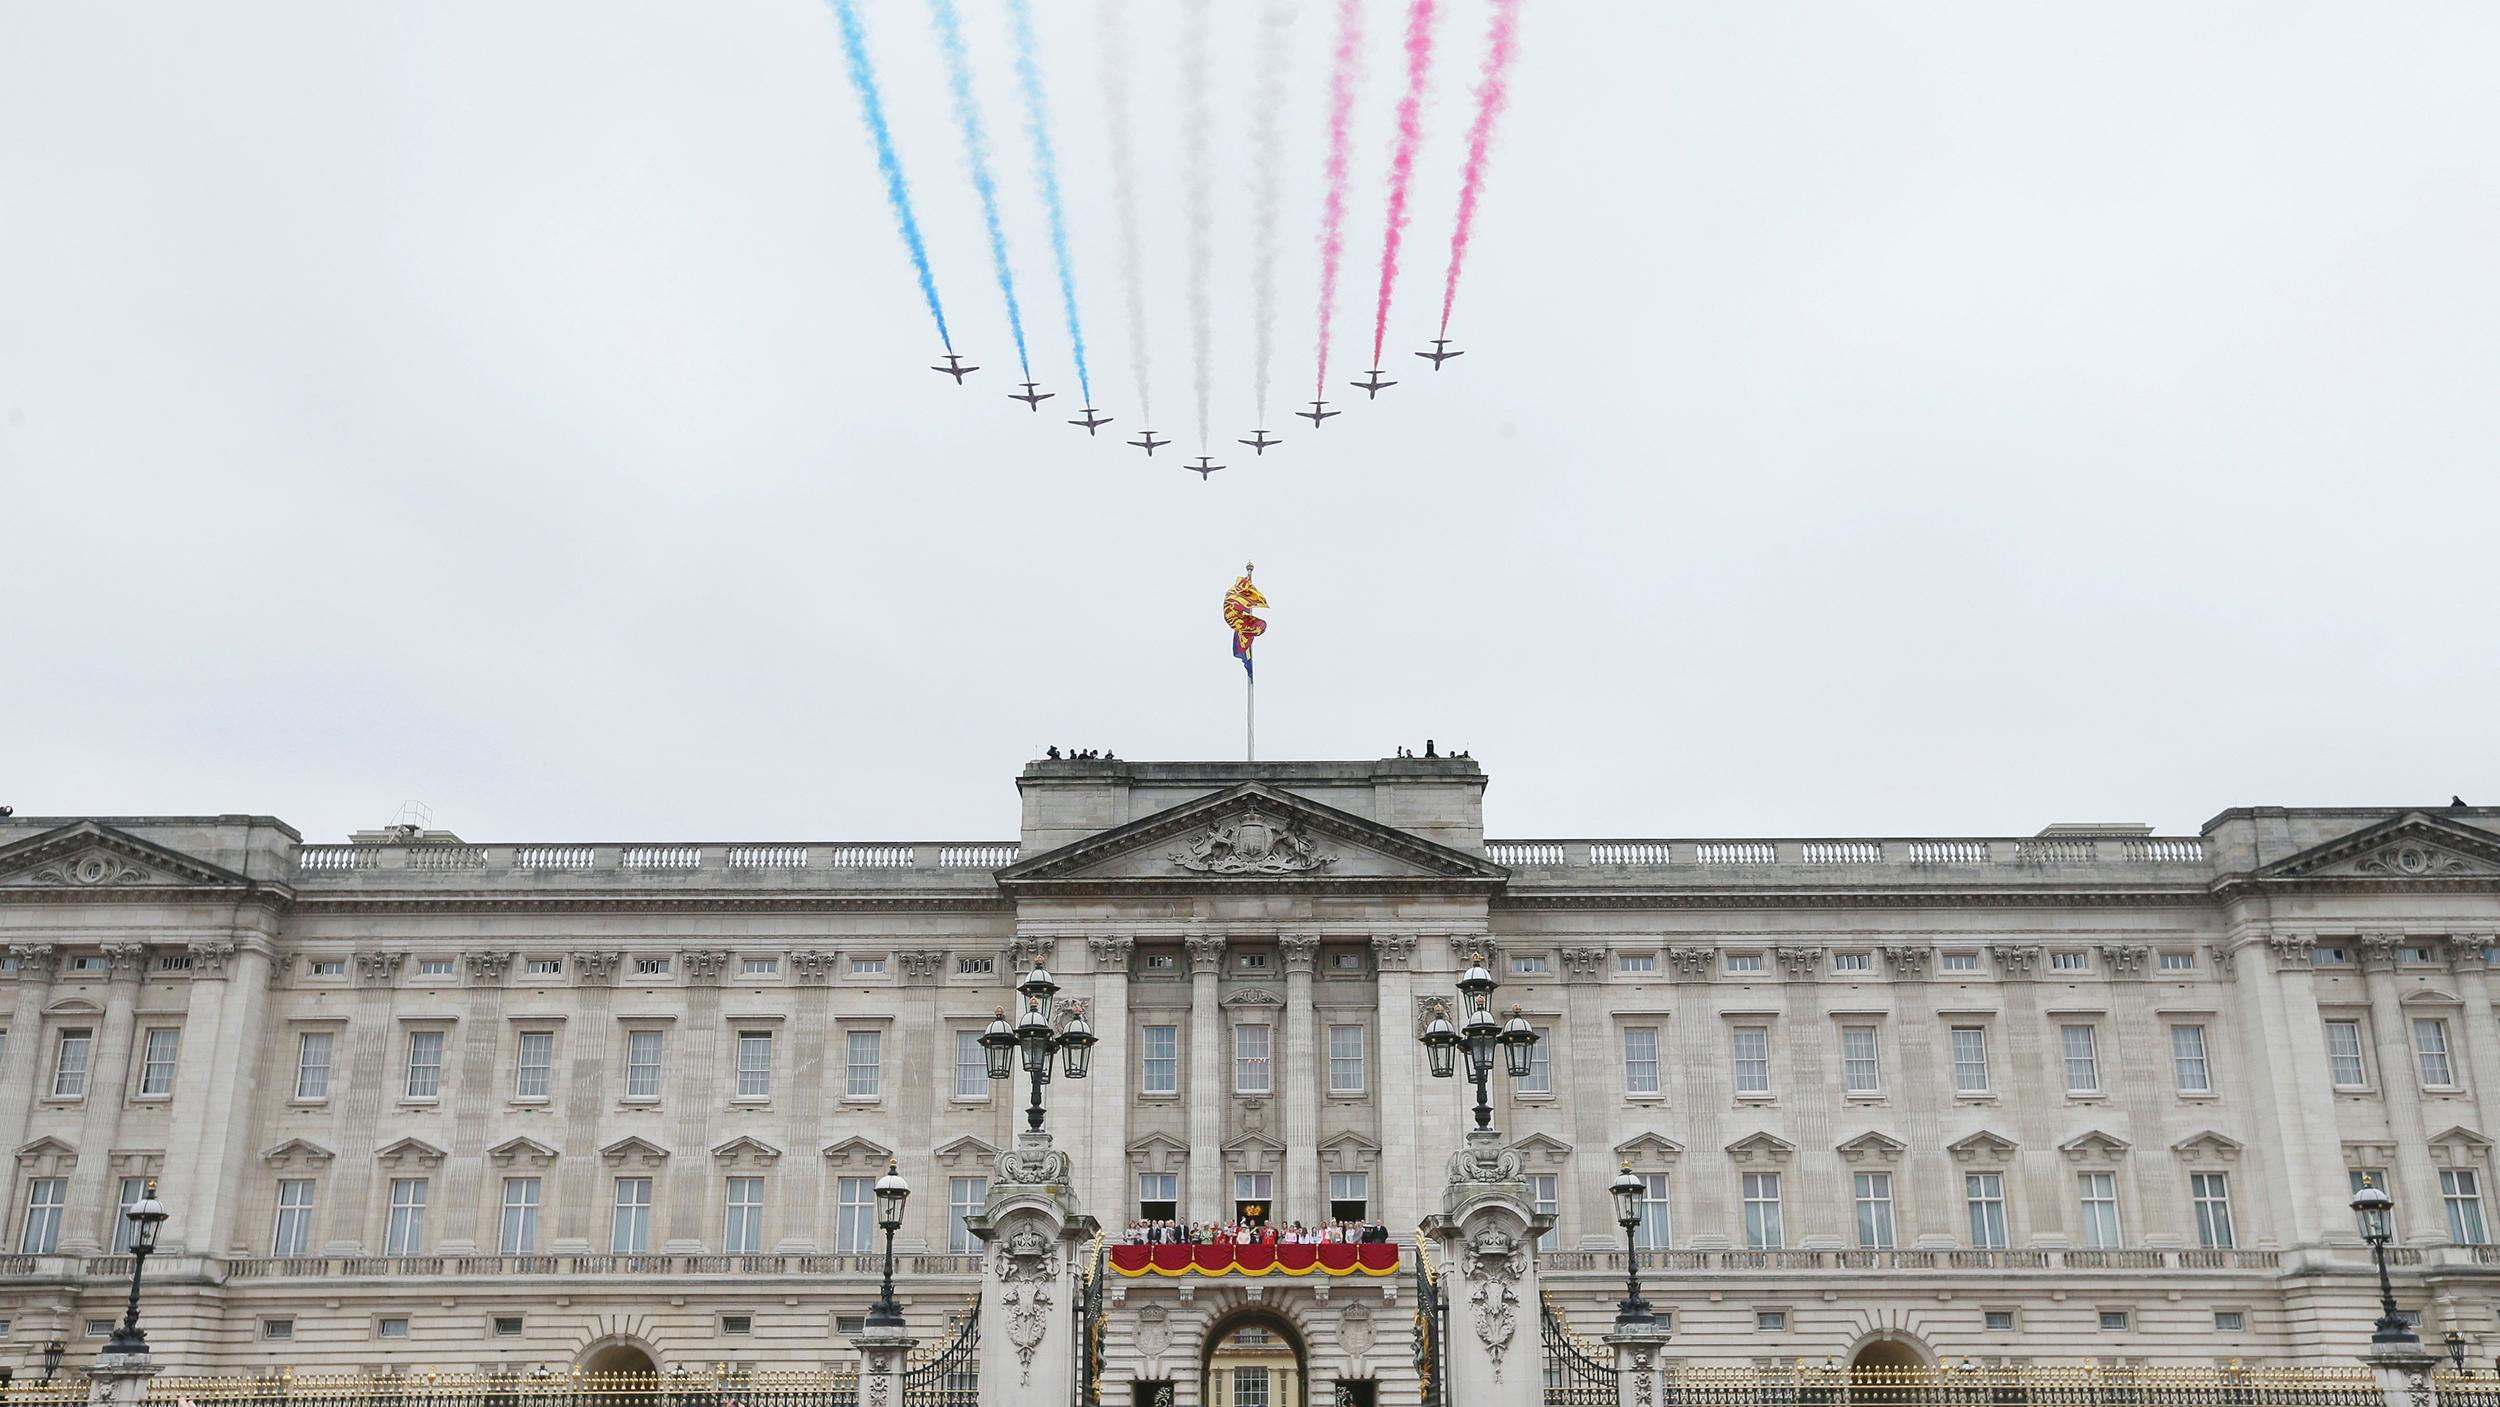 Buckingham Palace virtual tour gives public peek of royal ...